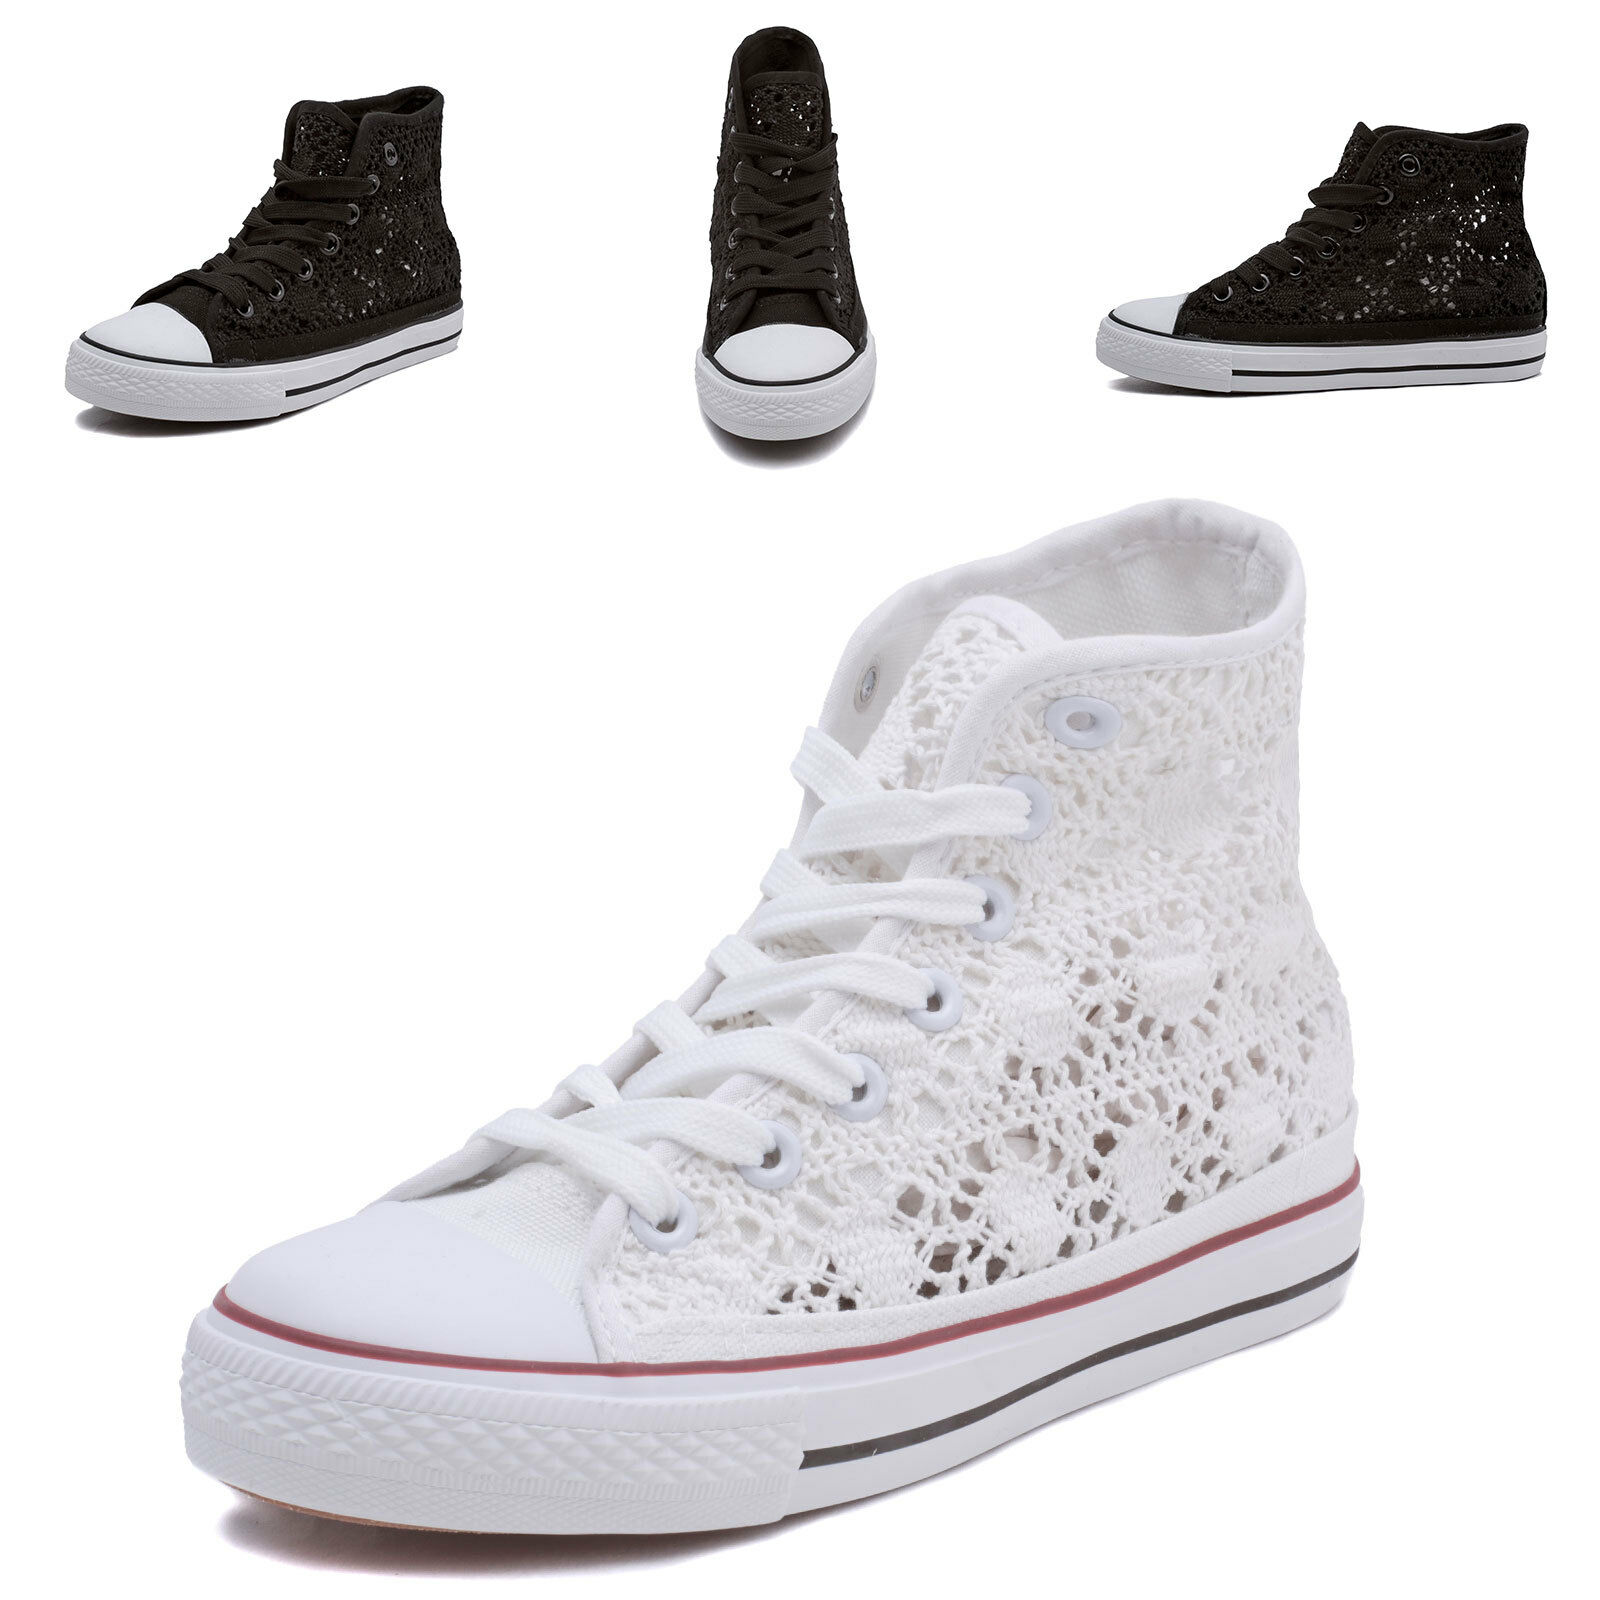 size 40 f741d 55ded Scarpe donna Sneakers Alta Casual da Ginnastica Pizzo para ...